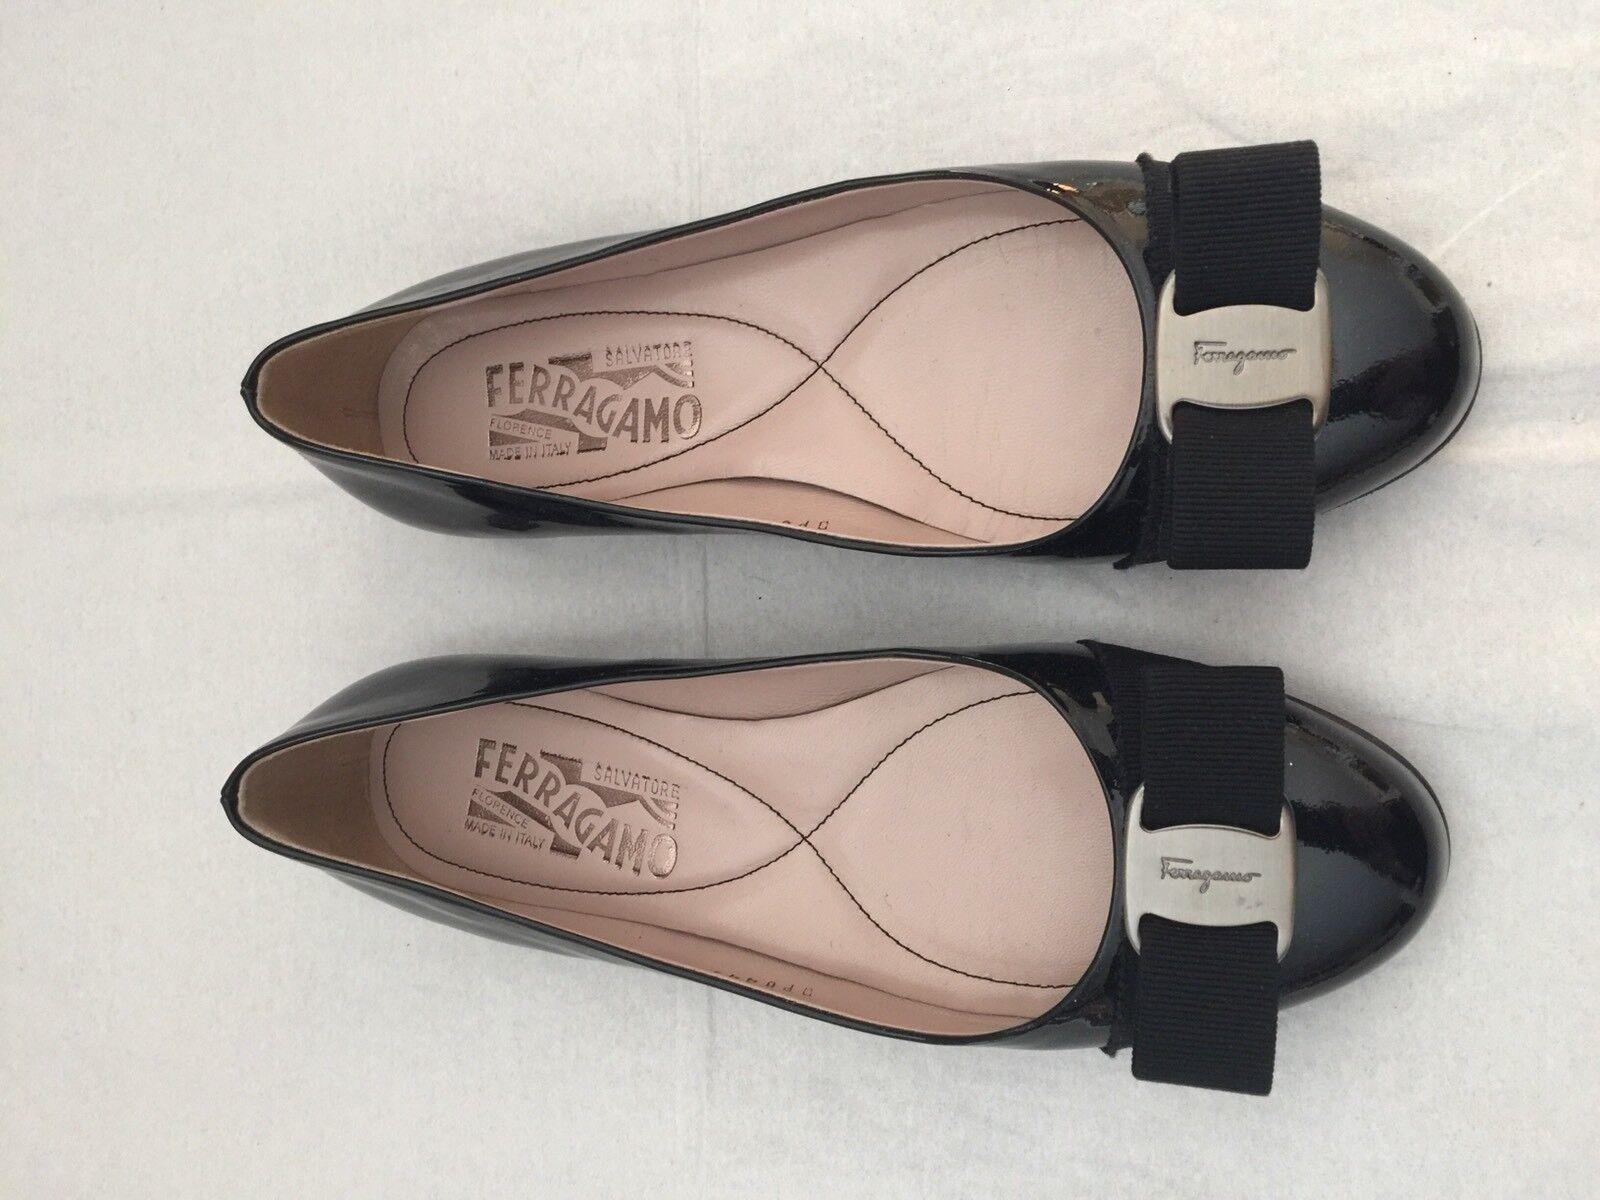 Men/Women Women Ferragamo Flats, Black, Size 5C 5C Size durable High-quality materials Rich on-time delivery a09e98